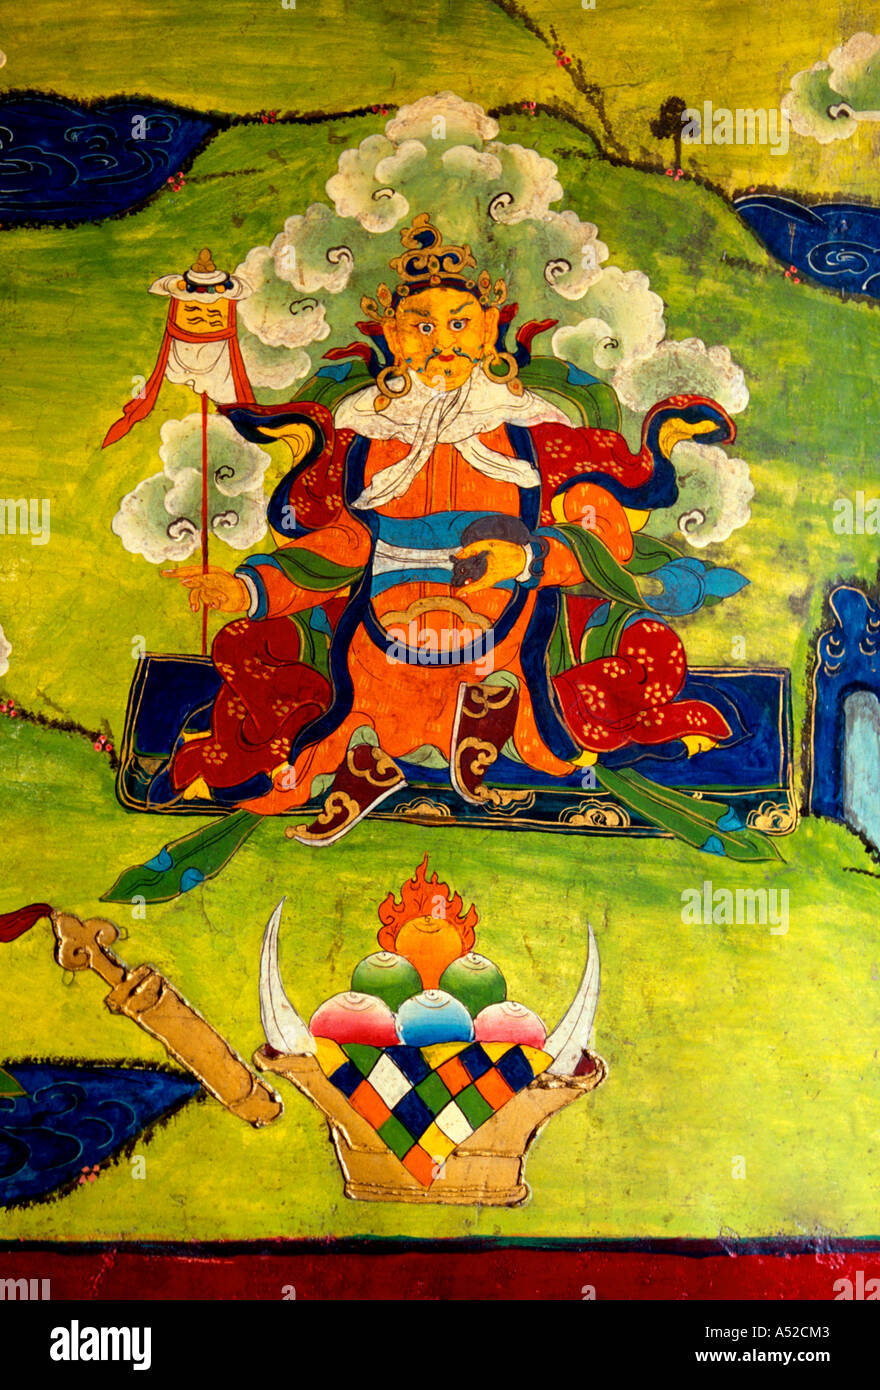 Tibetan Buddhism Wall Painting Holy Stock Photos & Tibetan Buddhism ...